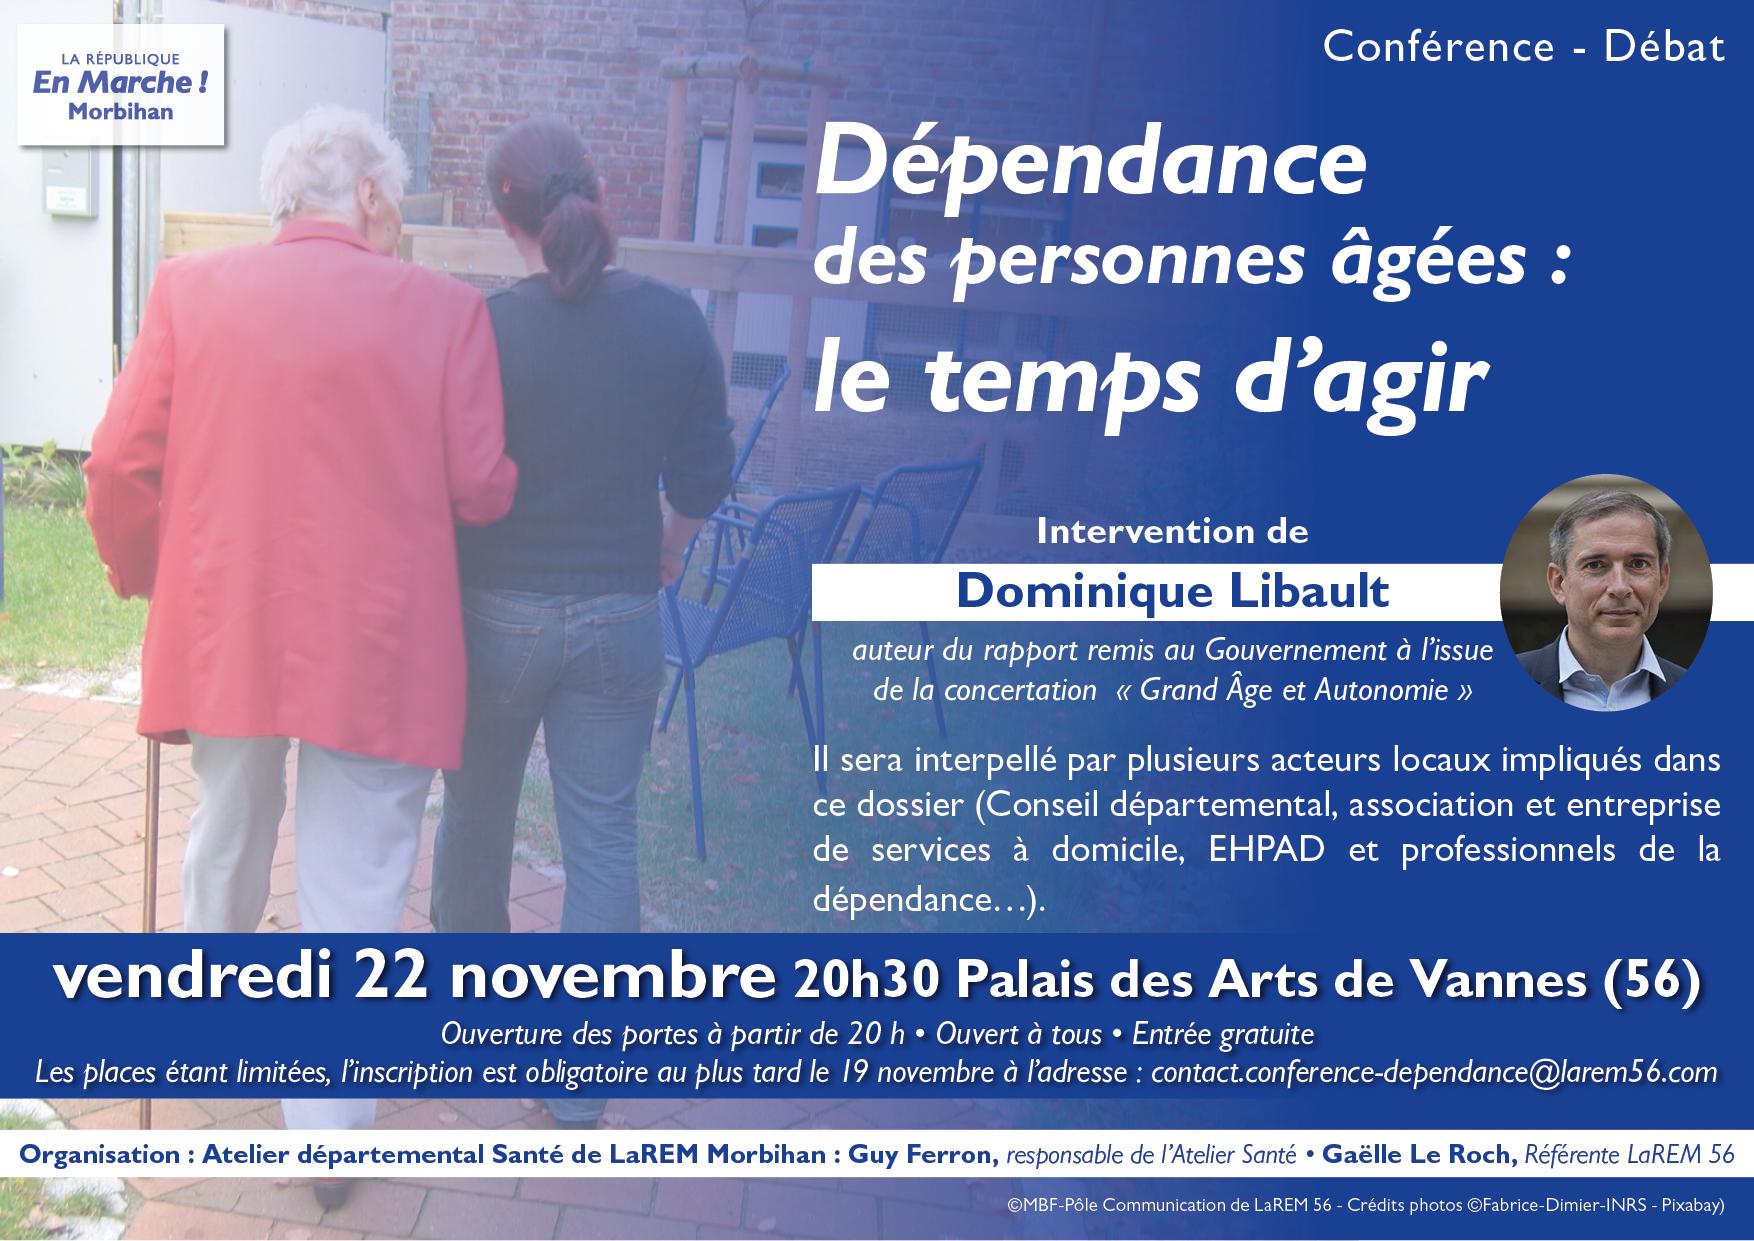 conference-debat-dependance-personnes-agees